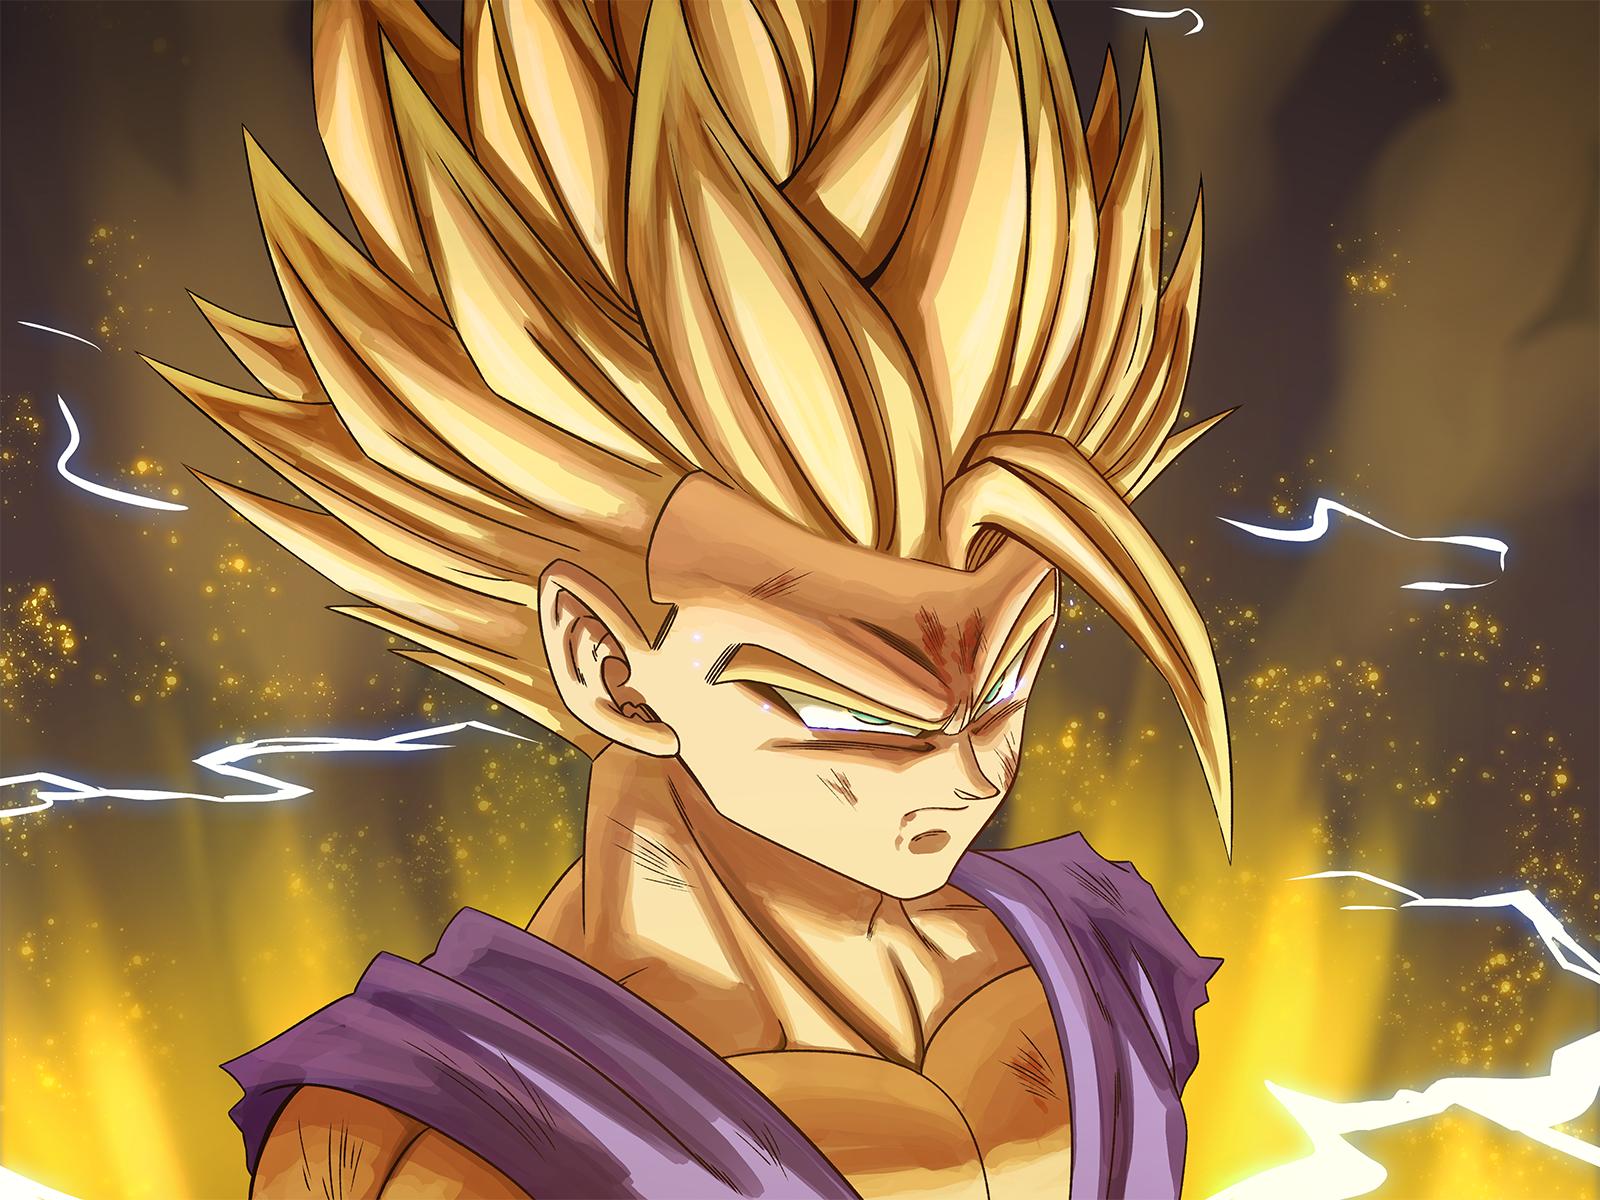 Kid Gohan Ssj2 Oc Dbz Anime Dragon Ball Super Dragon Ball Image Dragon Ball Art